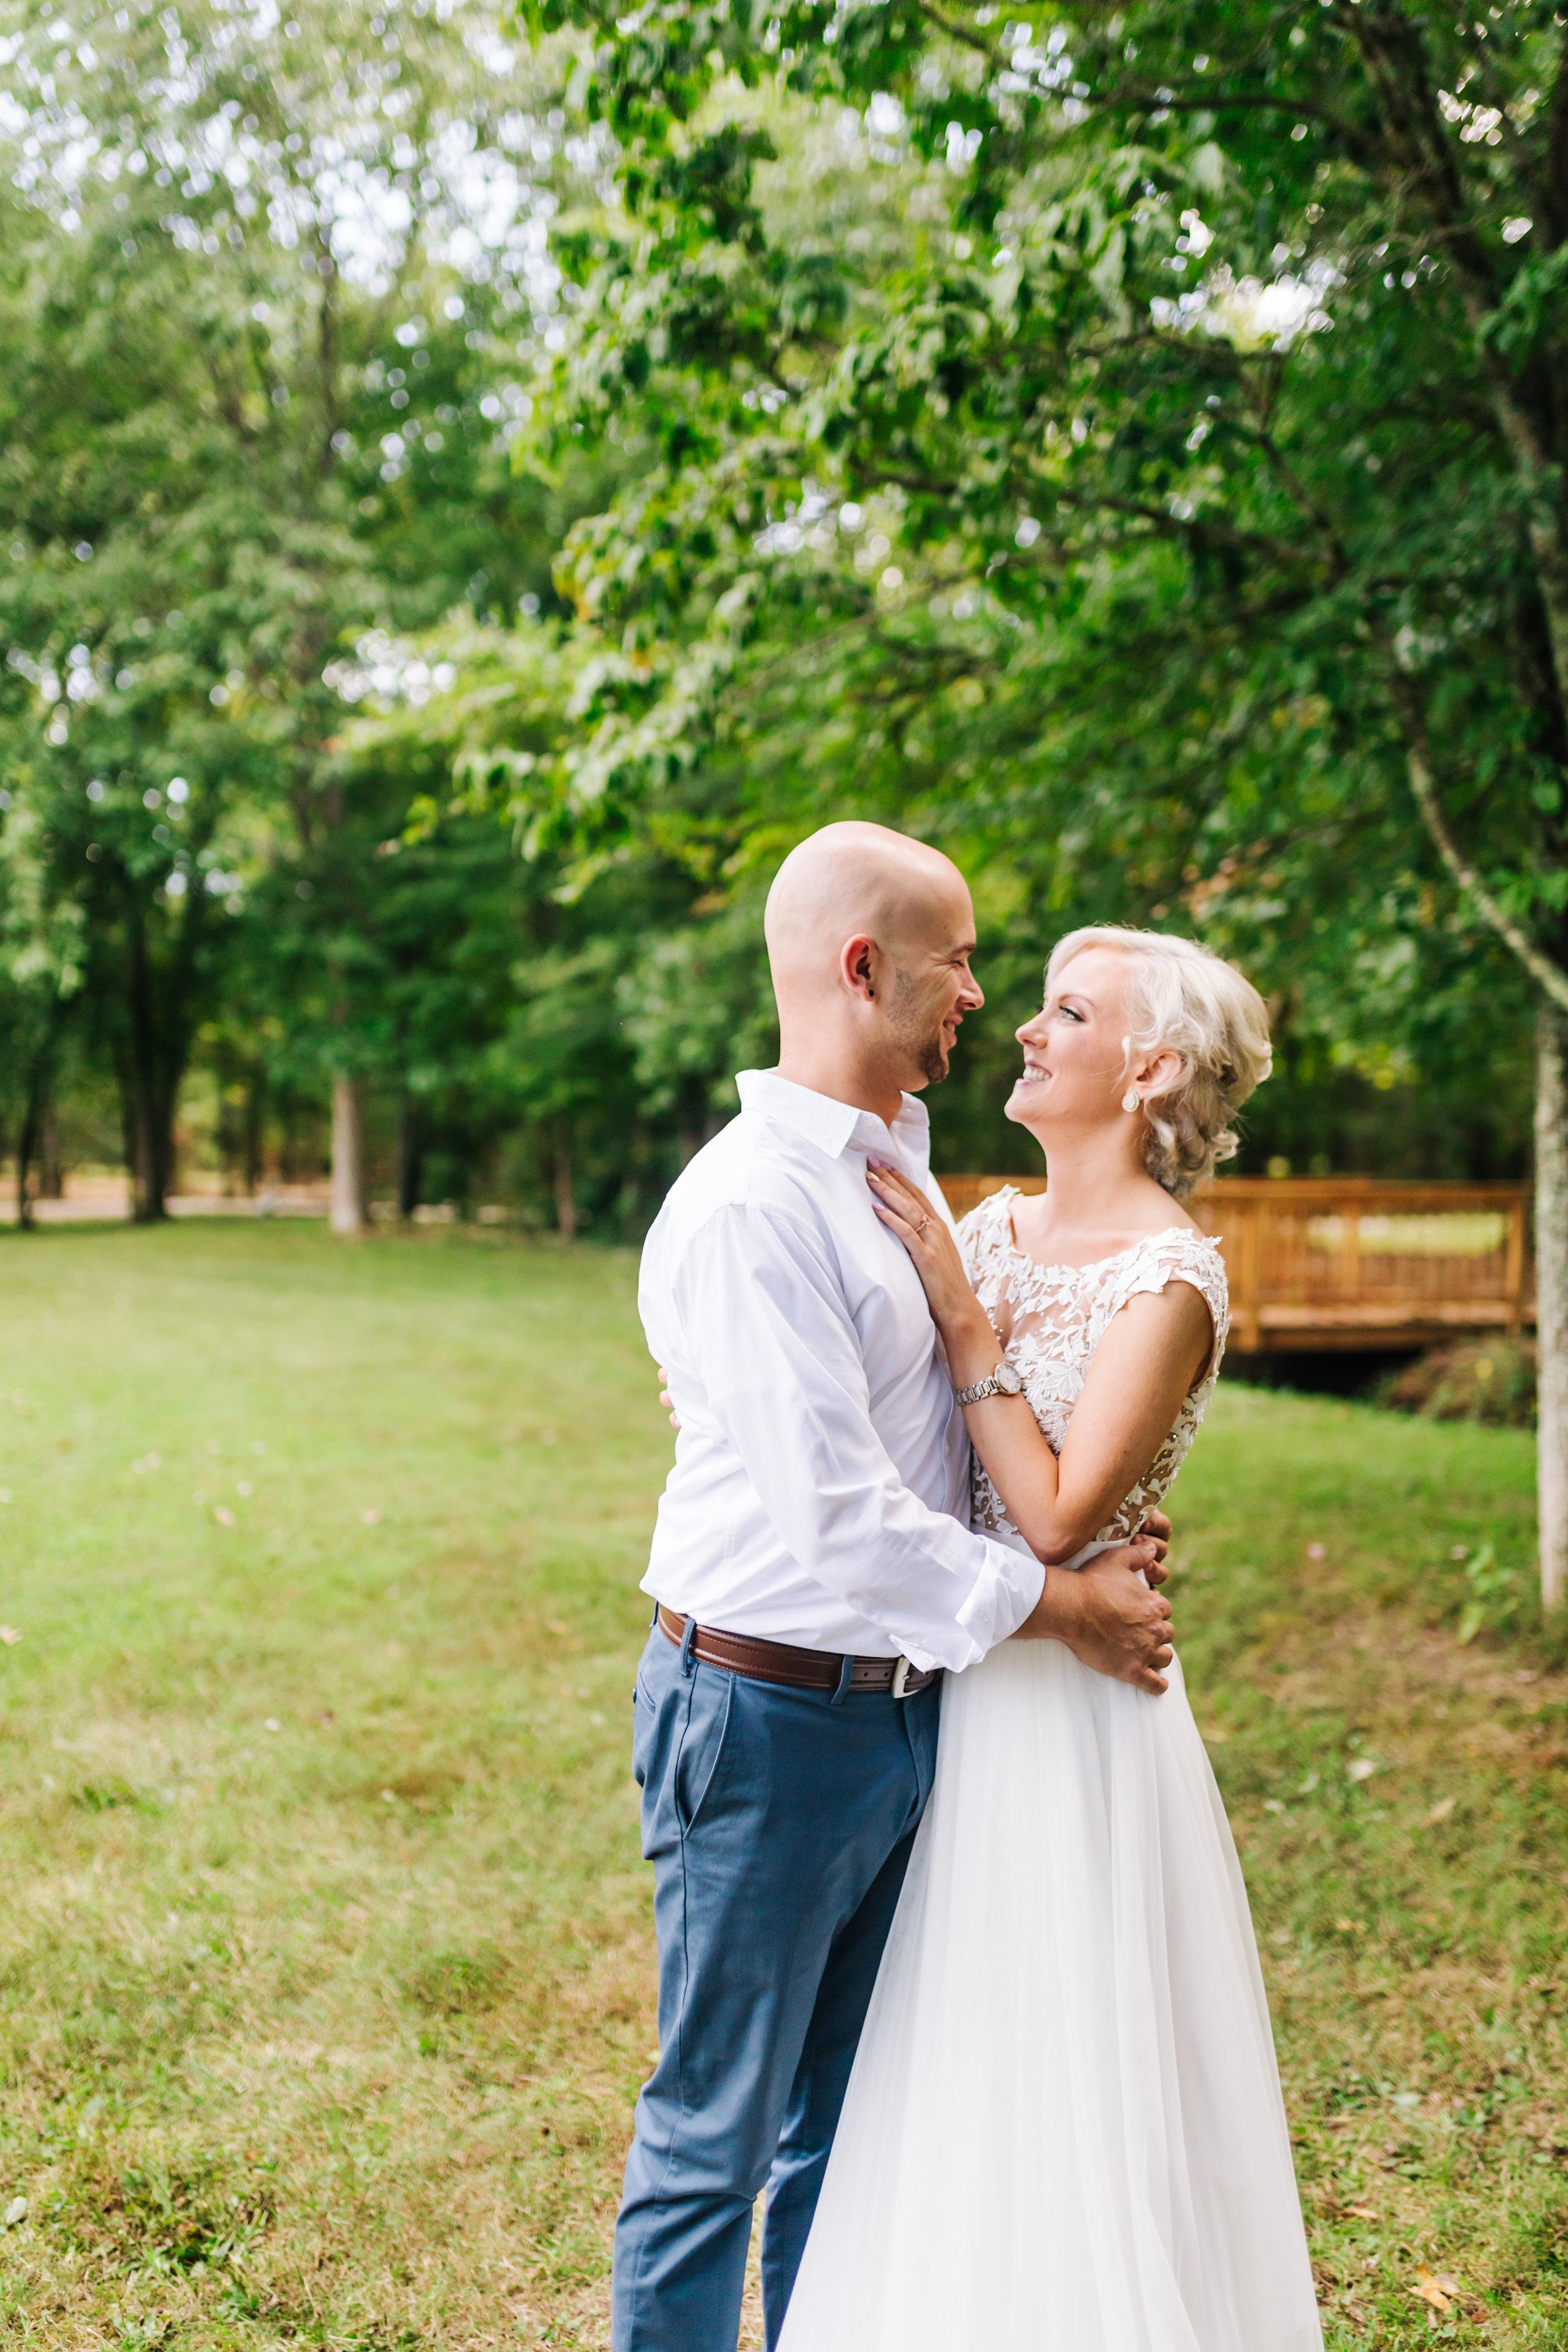 2018.09.02 Ray and Sarah Prizner Nashville TN Wedding FINALS-109.jpg